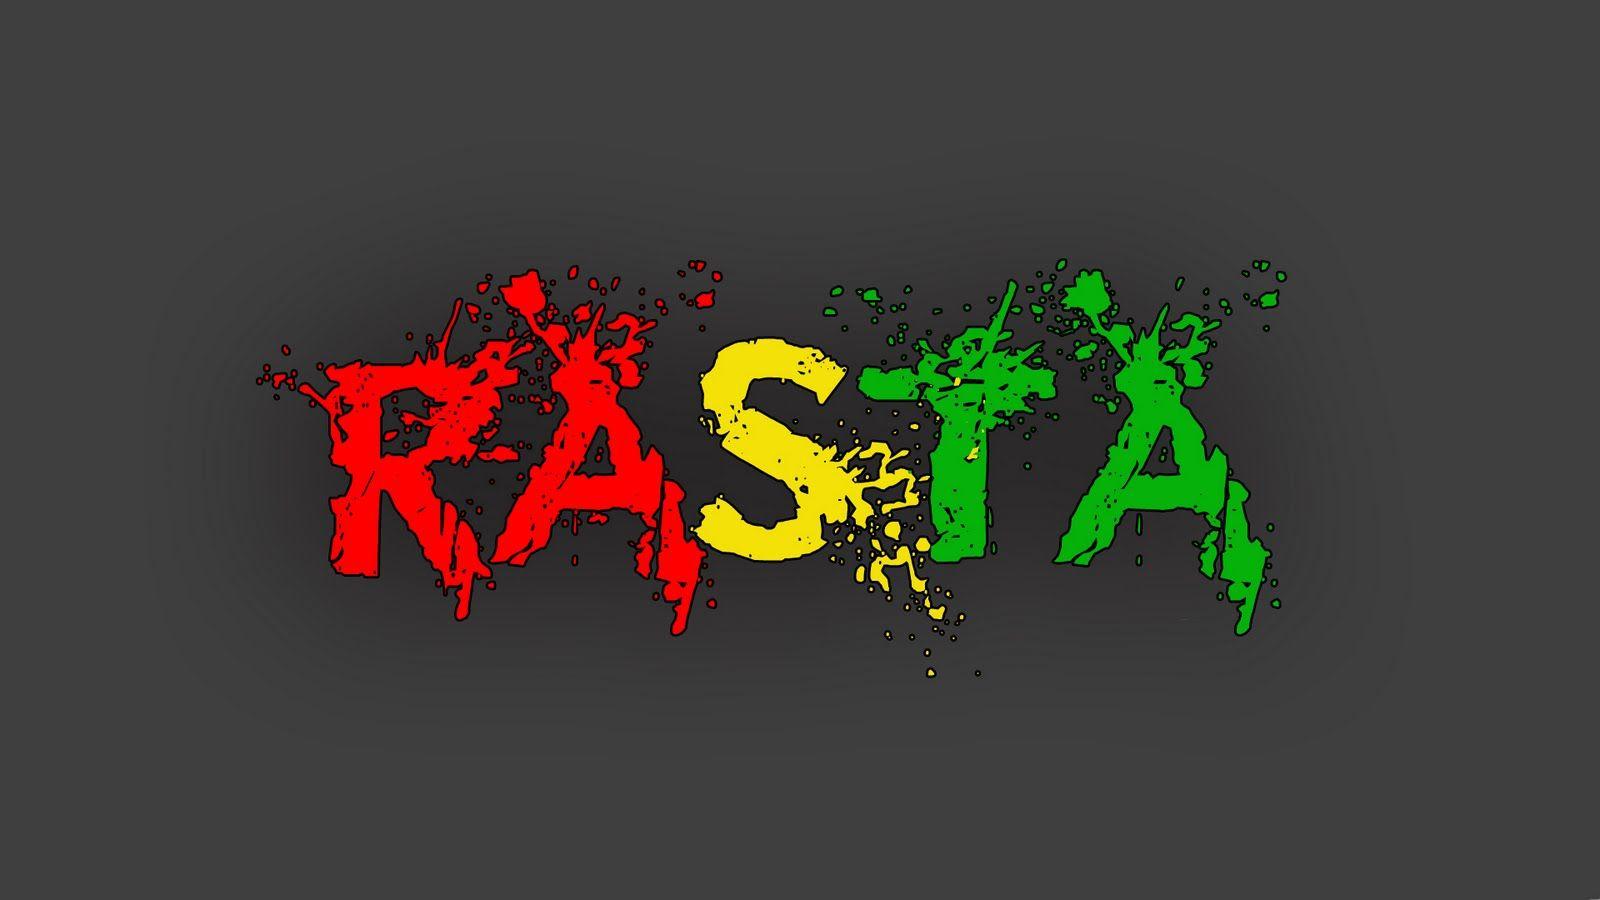 Rasta Love Quotes Google Image Result For Httpwww.wallsavewallpapers